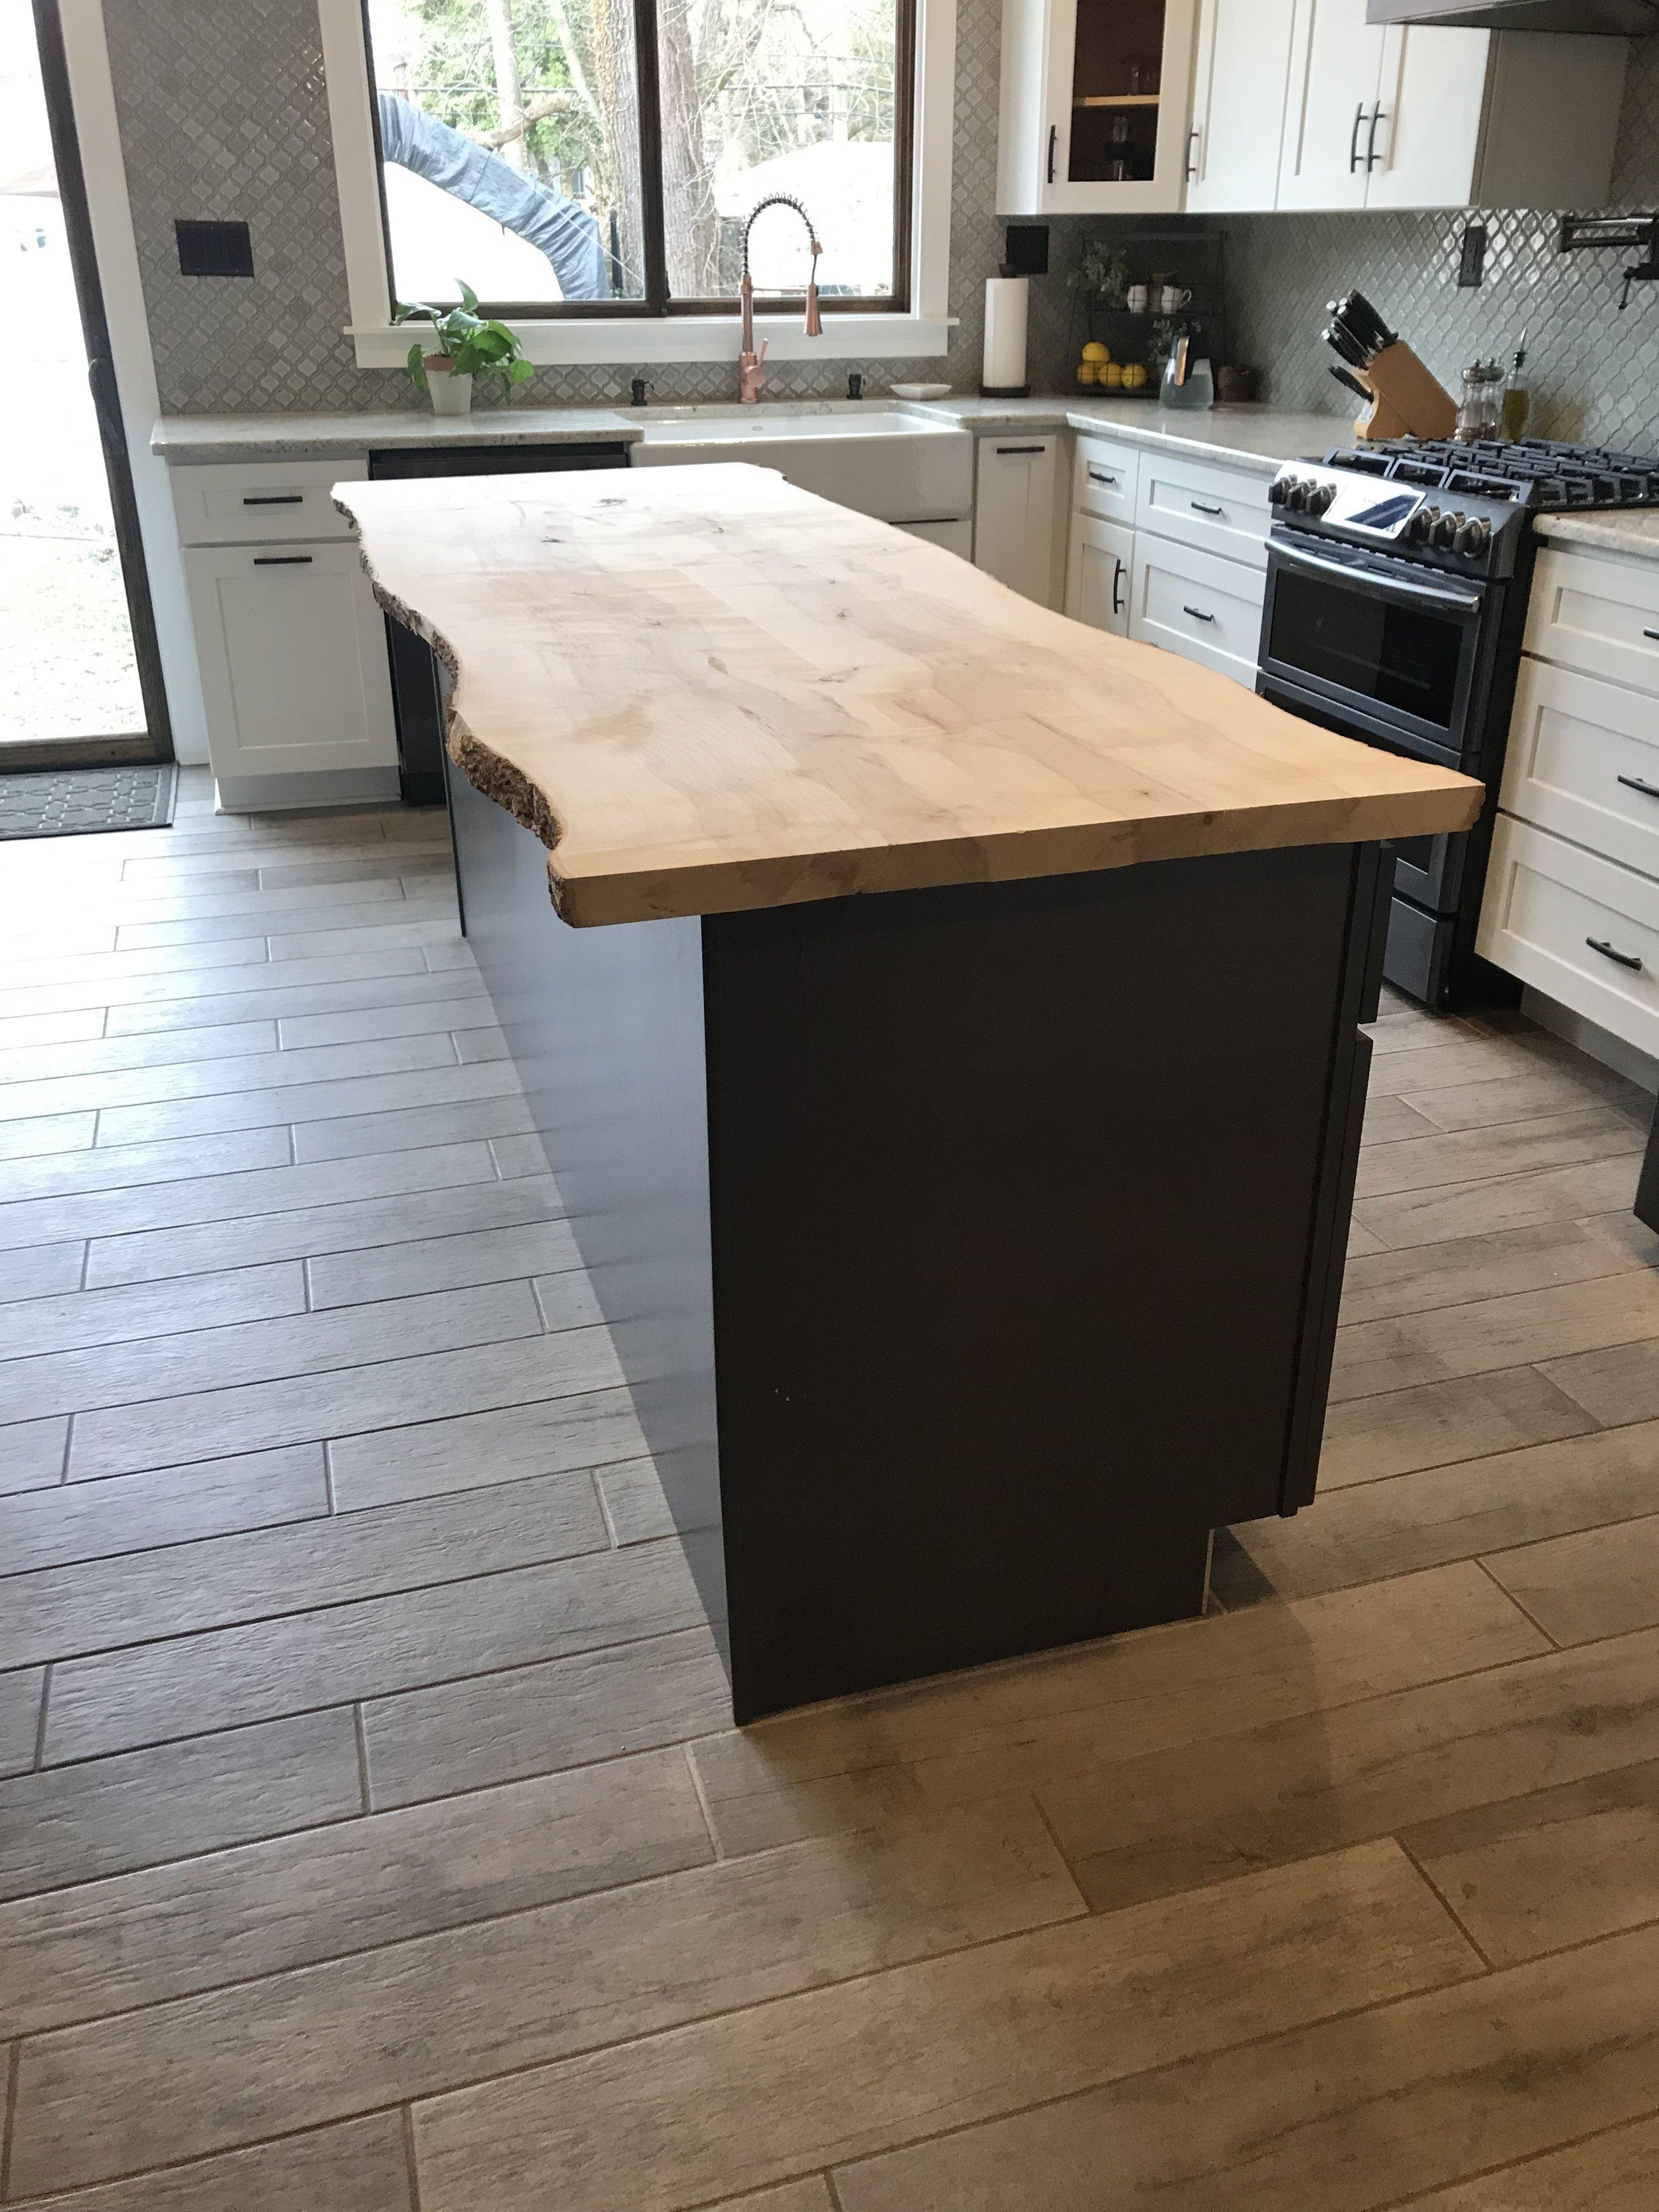 A custom kitchen counter.